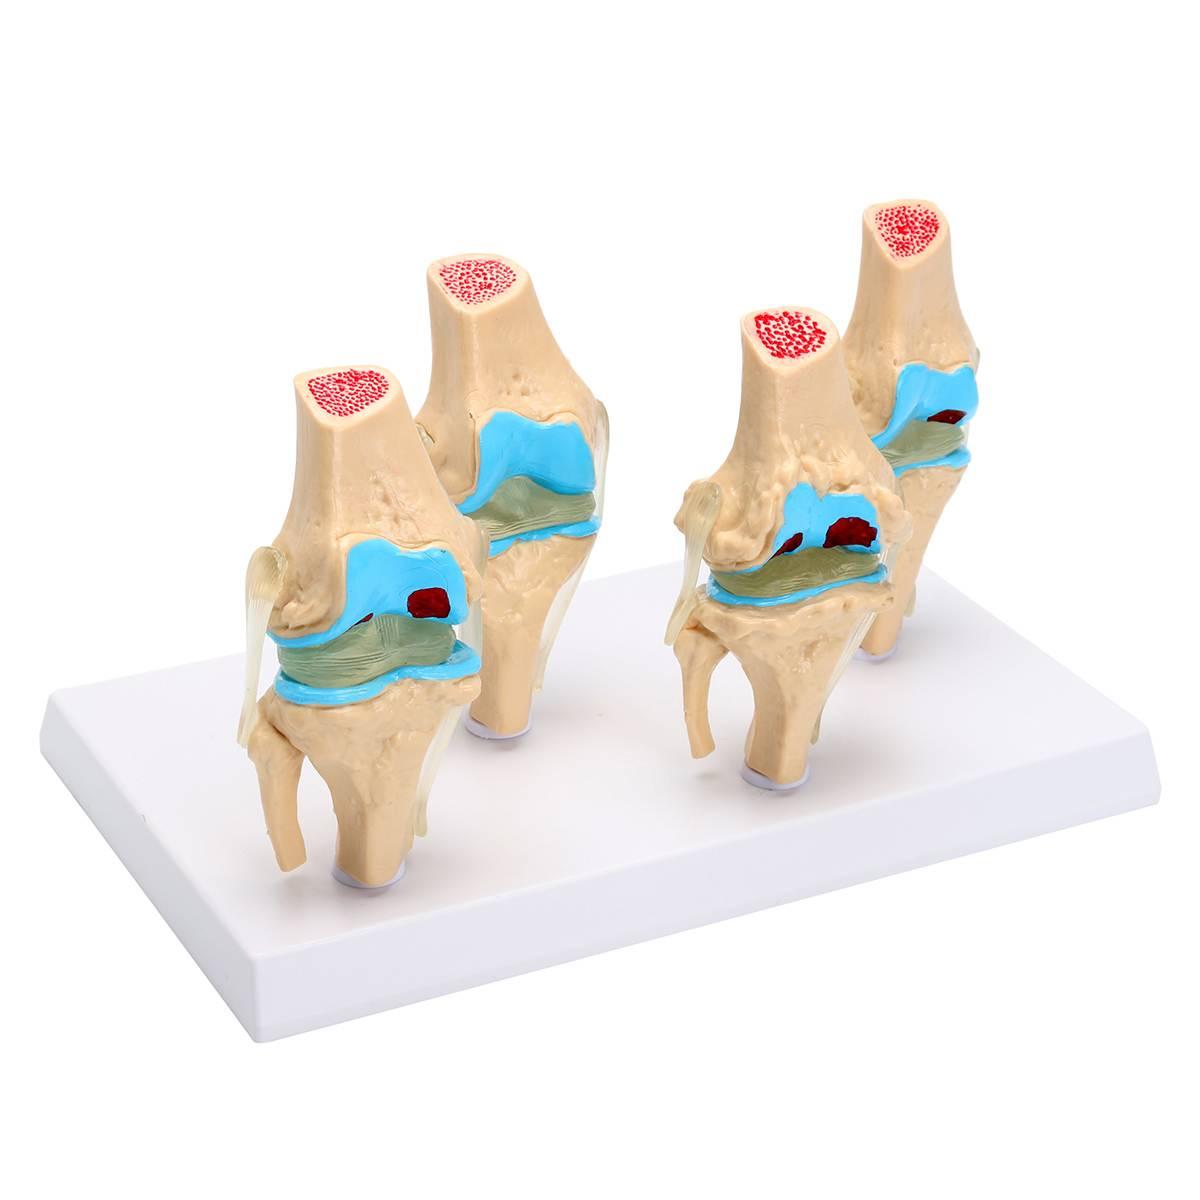 1 Set Detachable Human Skeleton Knee Joint Anatomy Model Osteoporosis Morbid State Models Medical Science Teaching Supplies